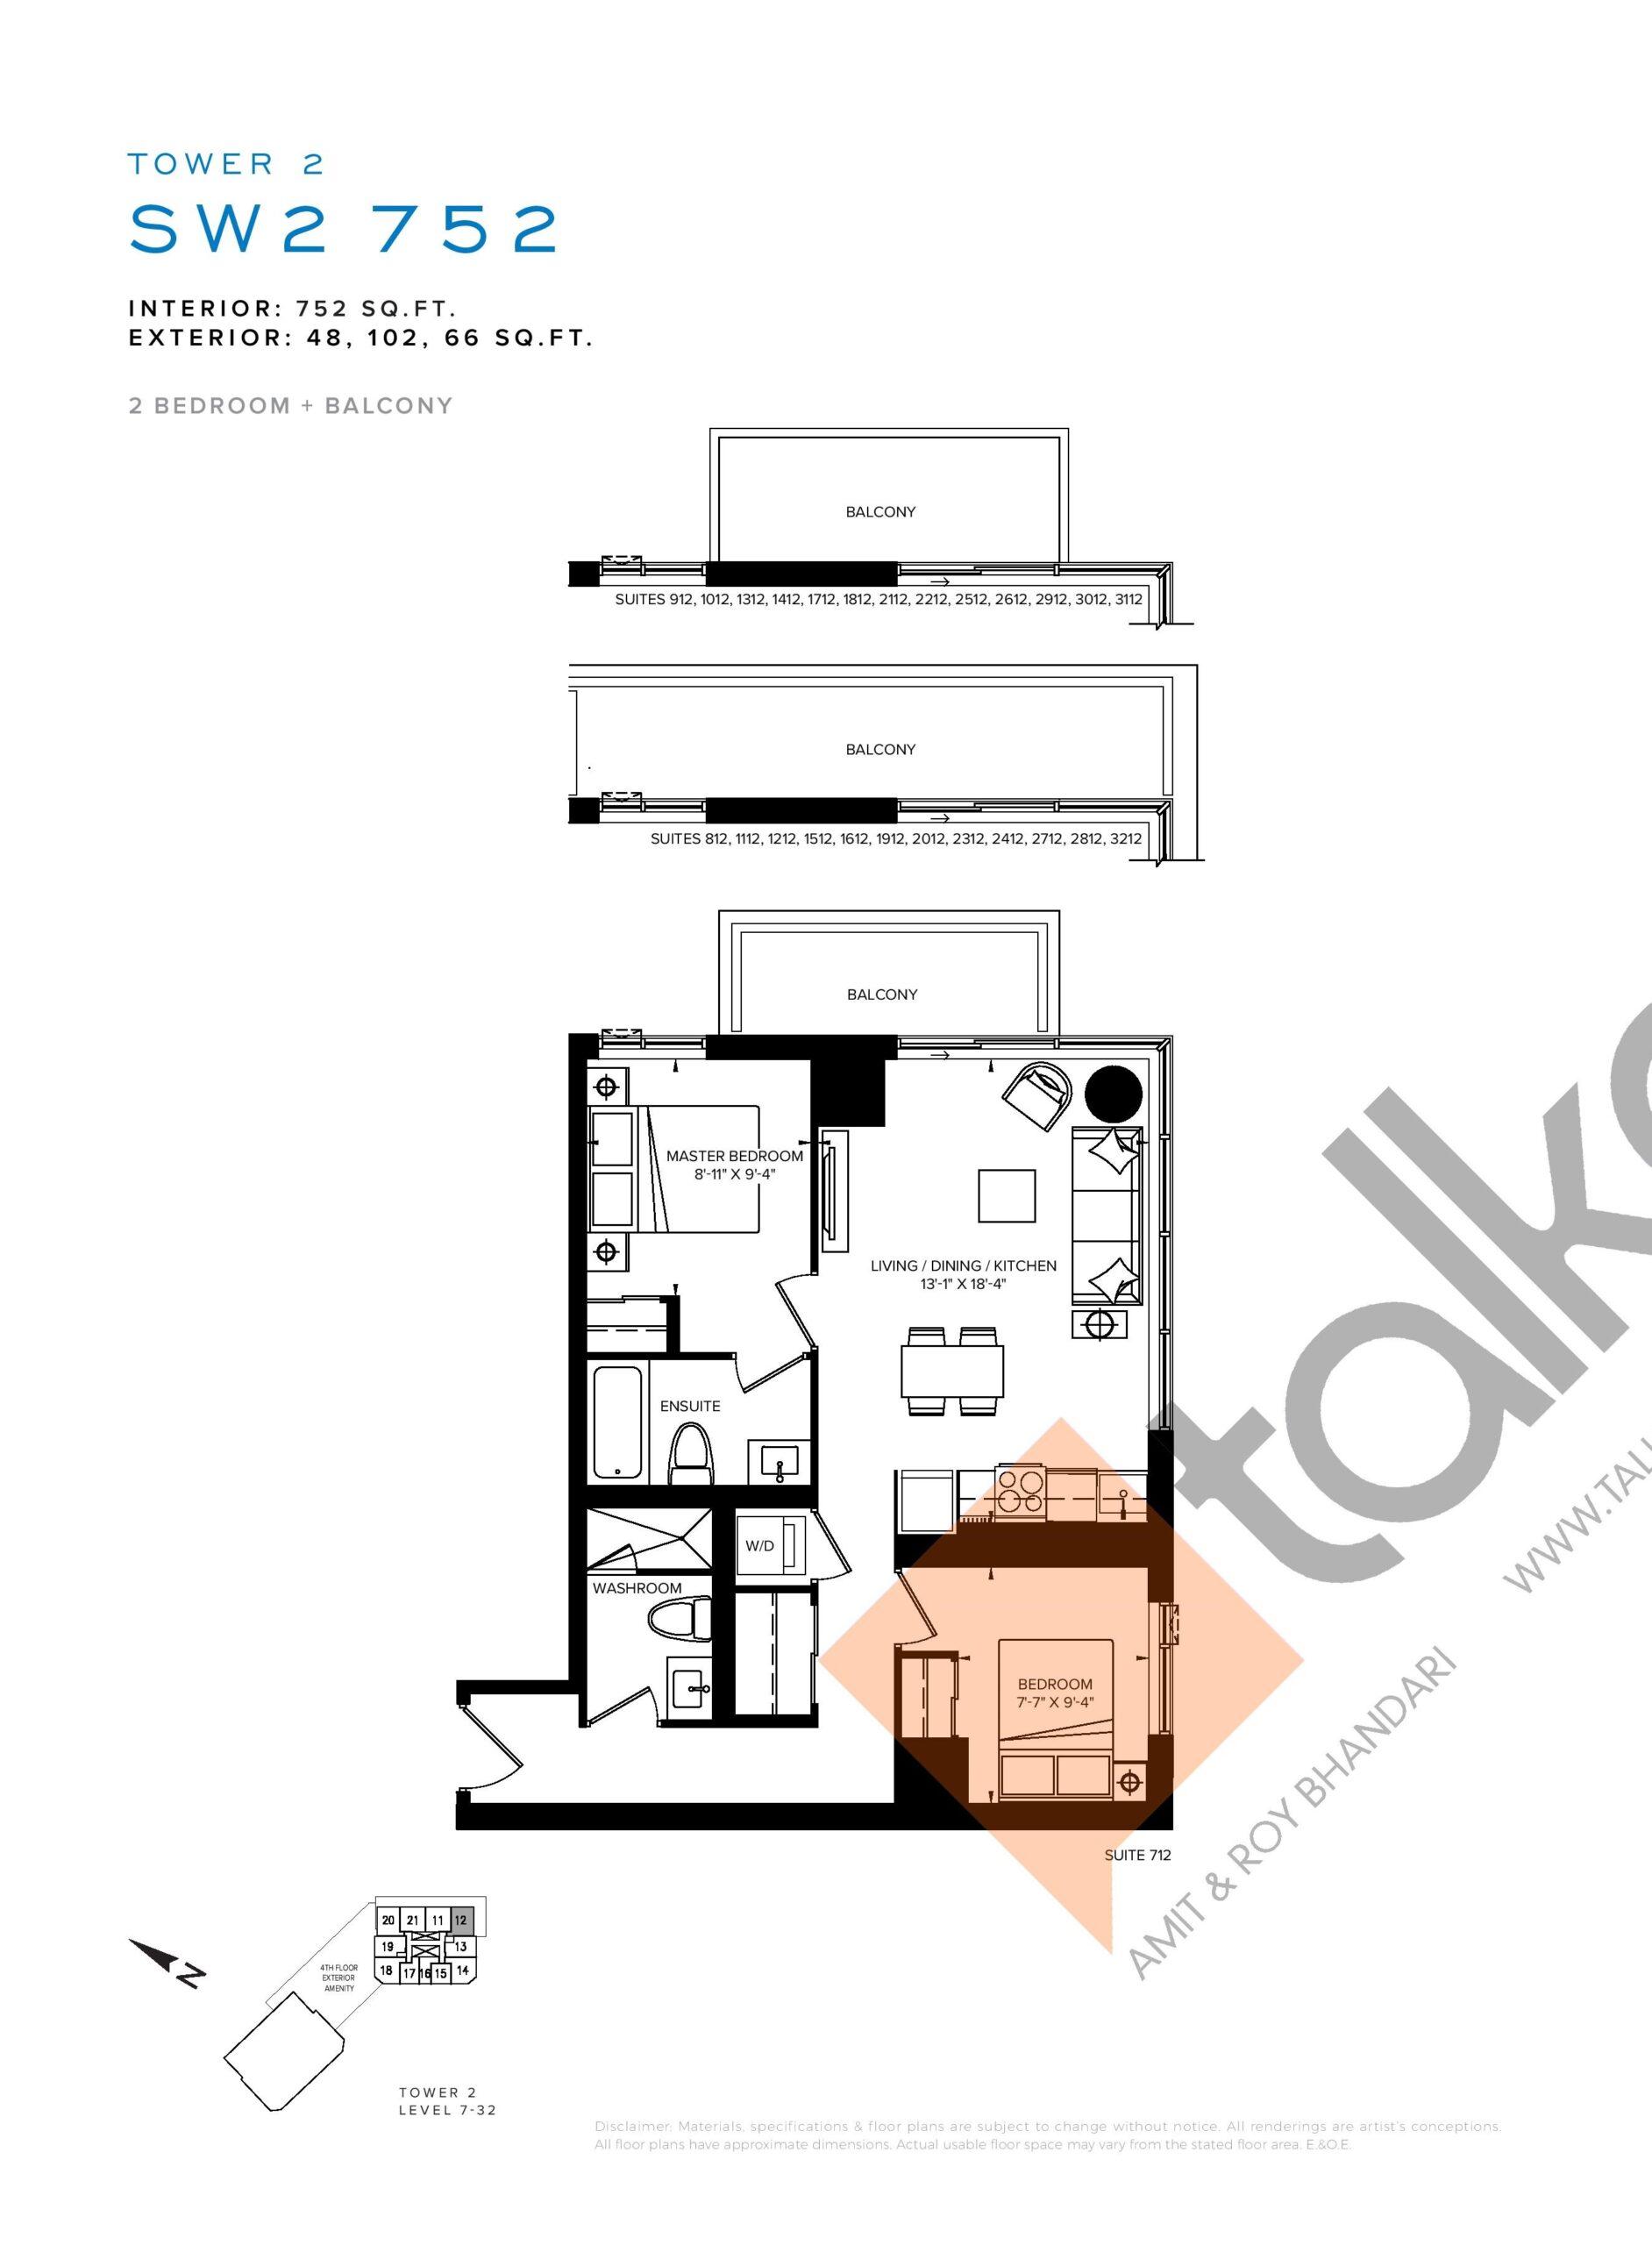 SW2 752 Floor Plan at SXSW Tower 2 Condos (SXSW2) - 752 sq.ft